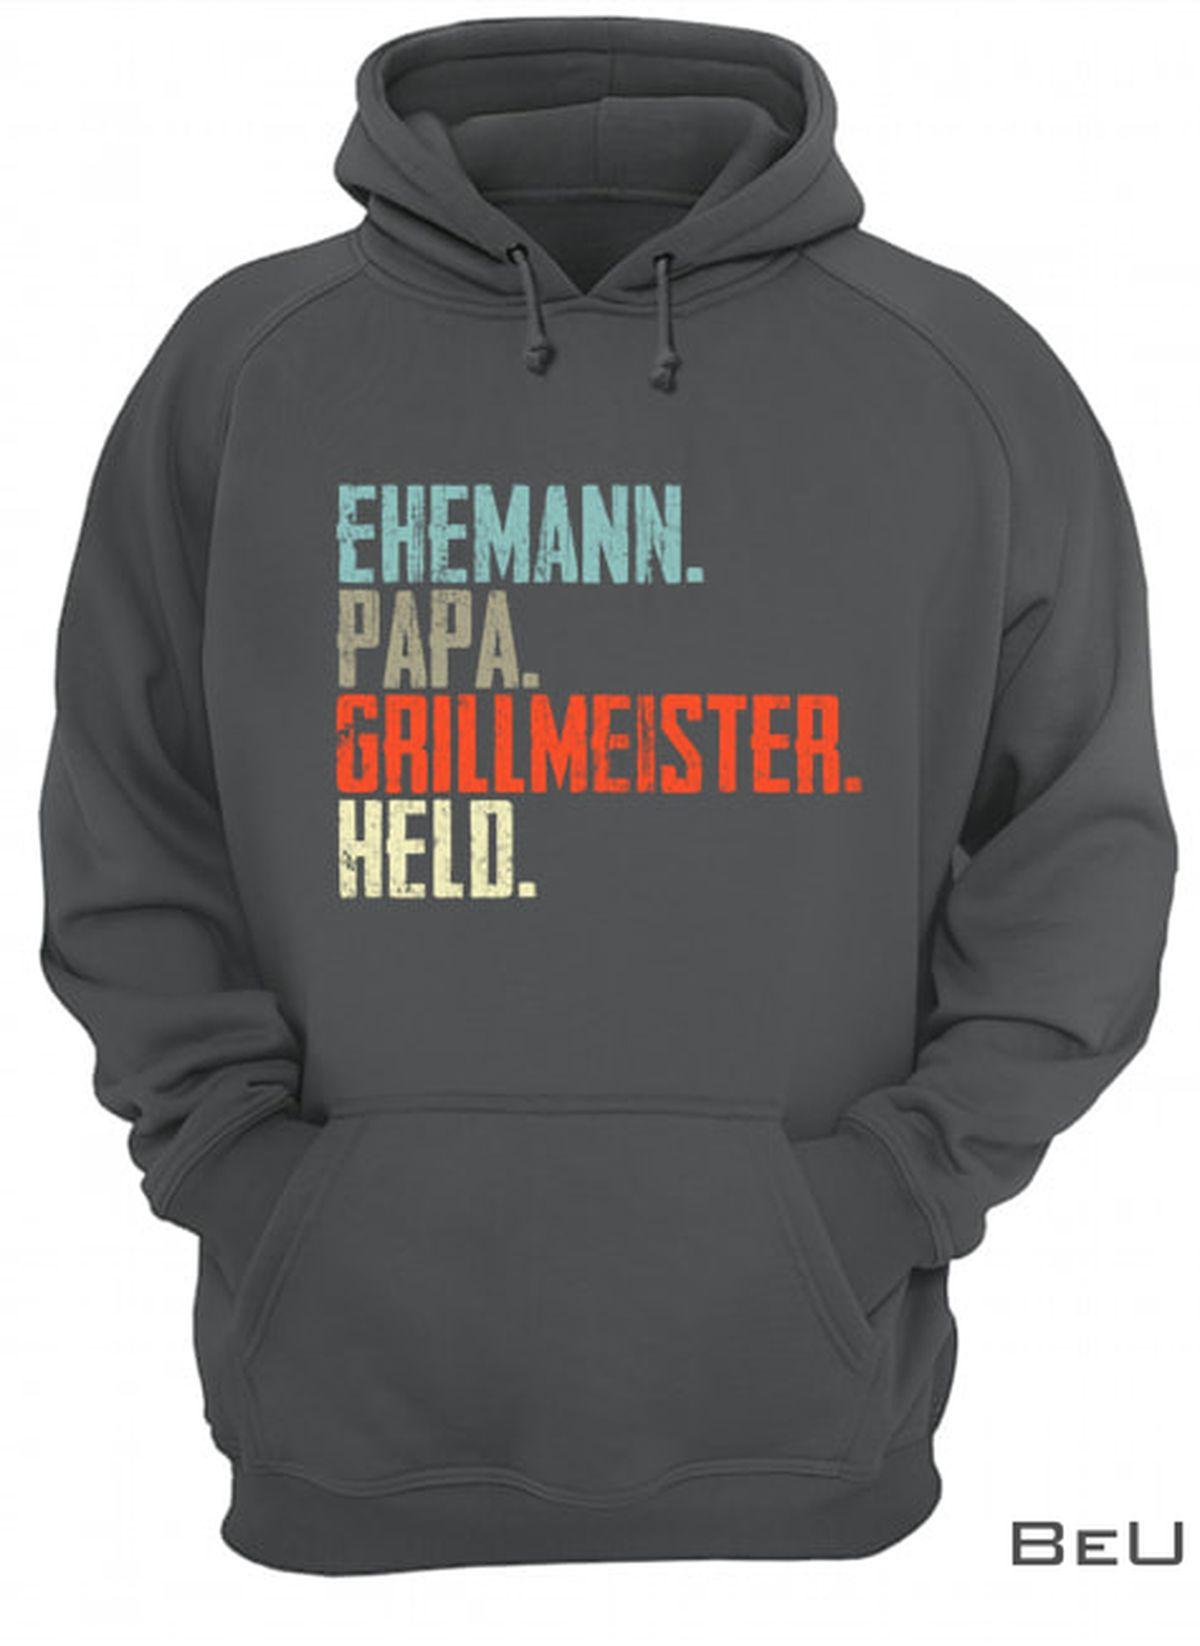 Ehemann Papa Grillmeister Held Shirtx